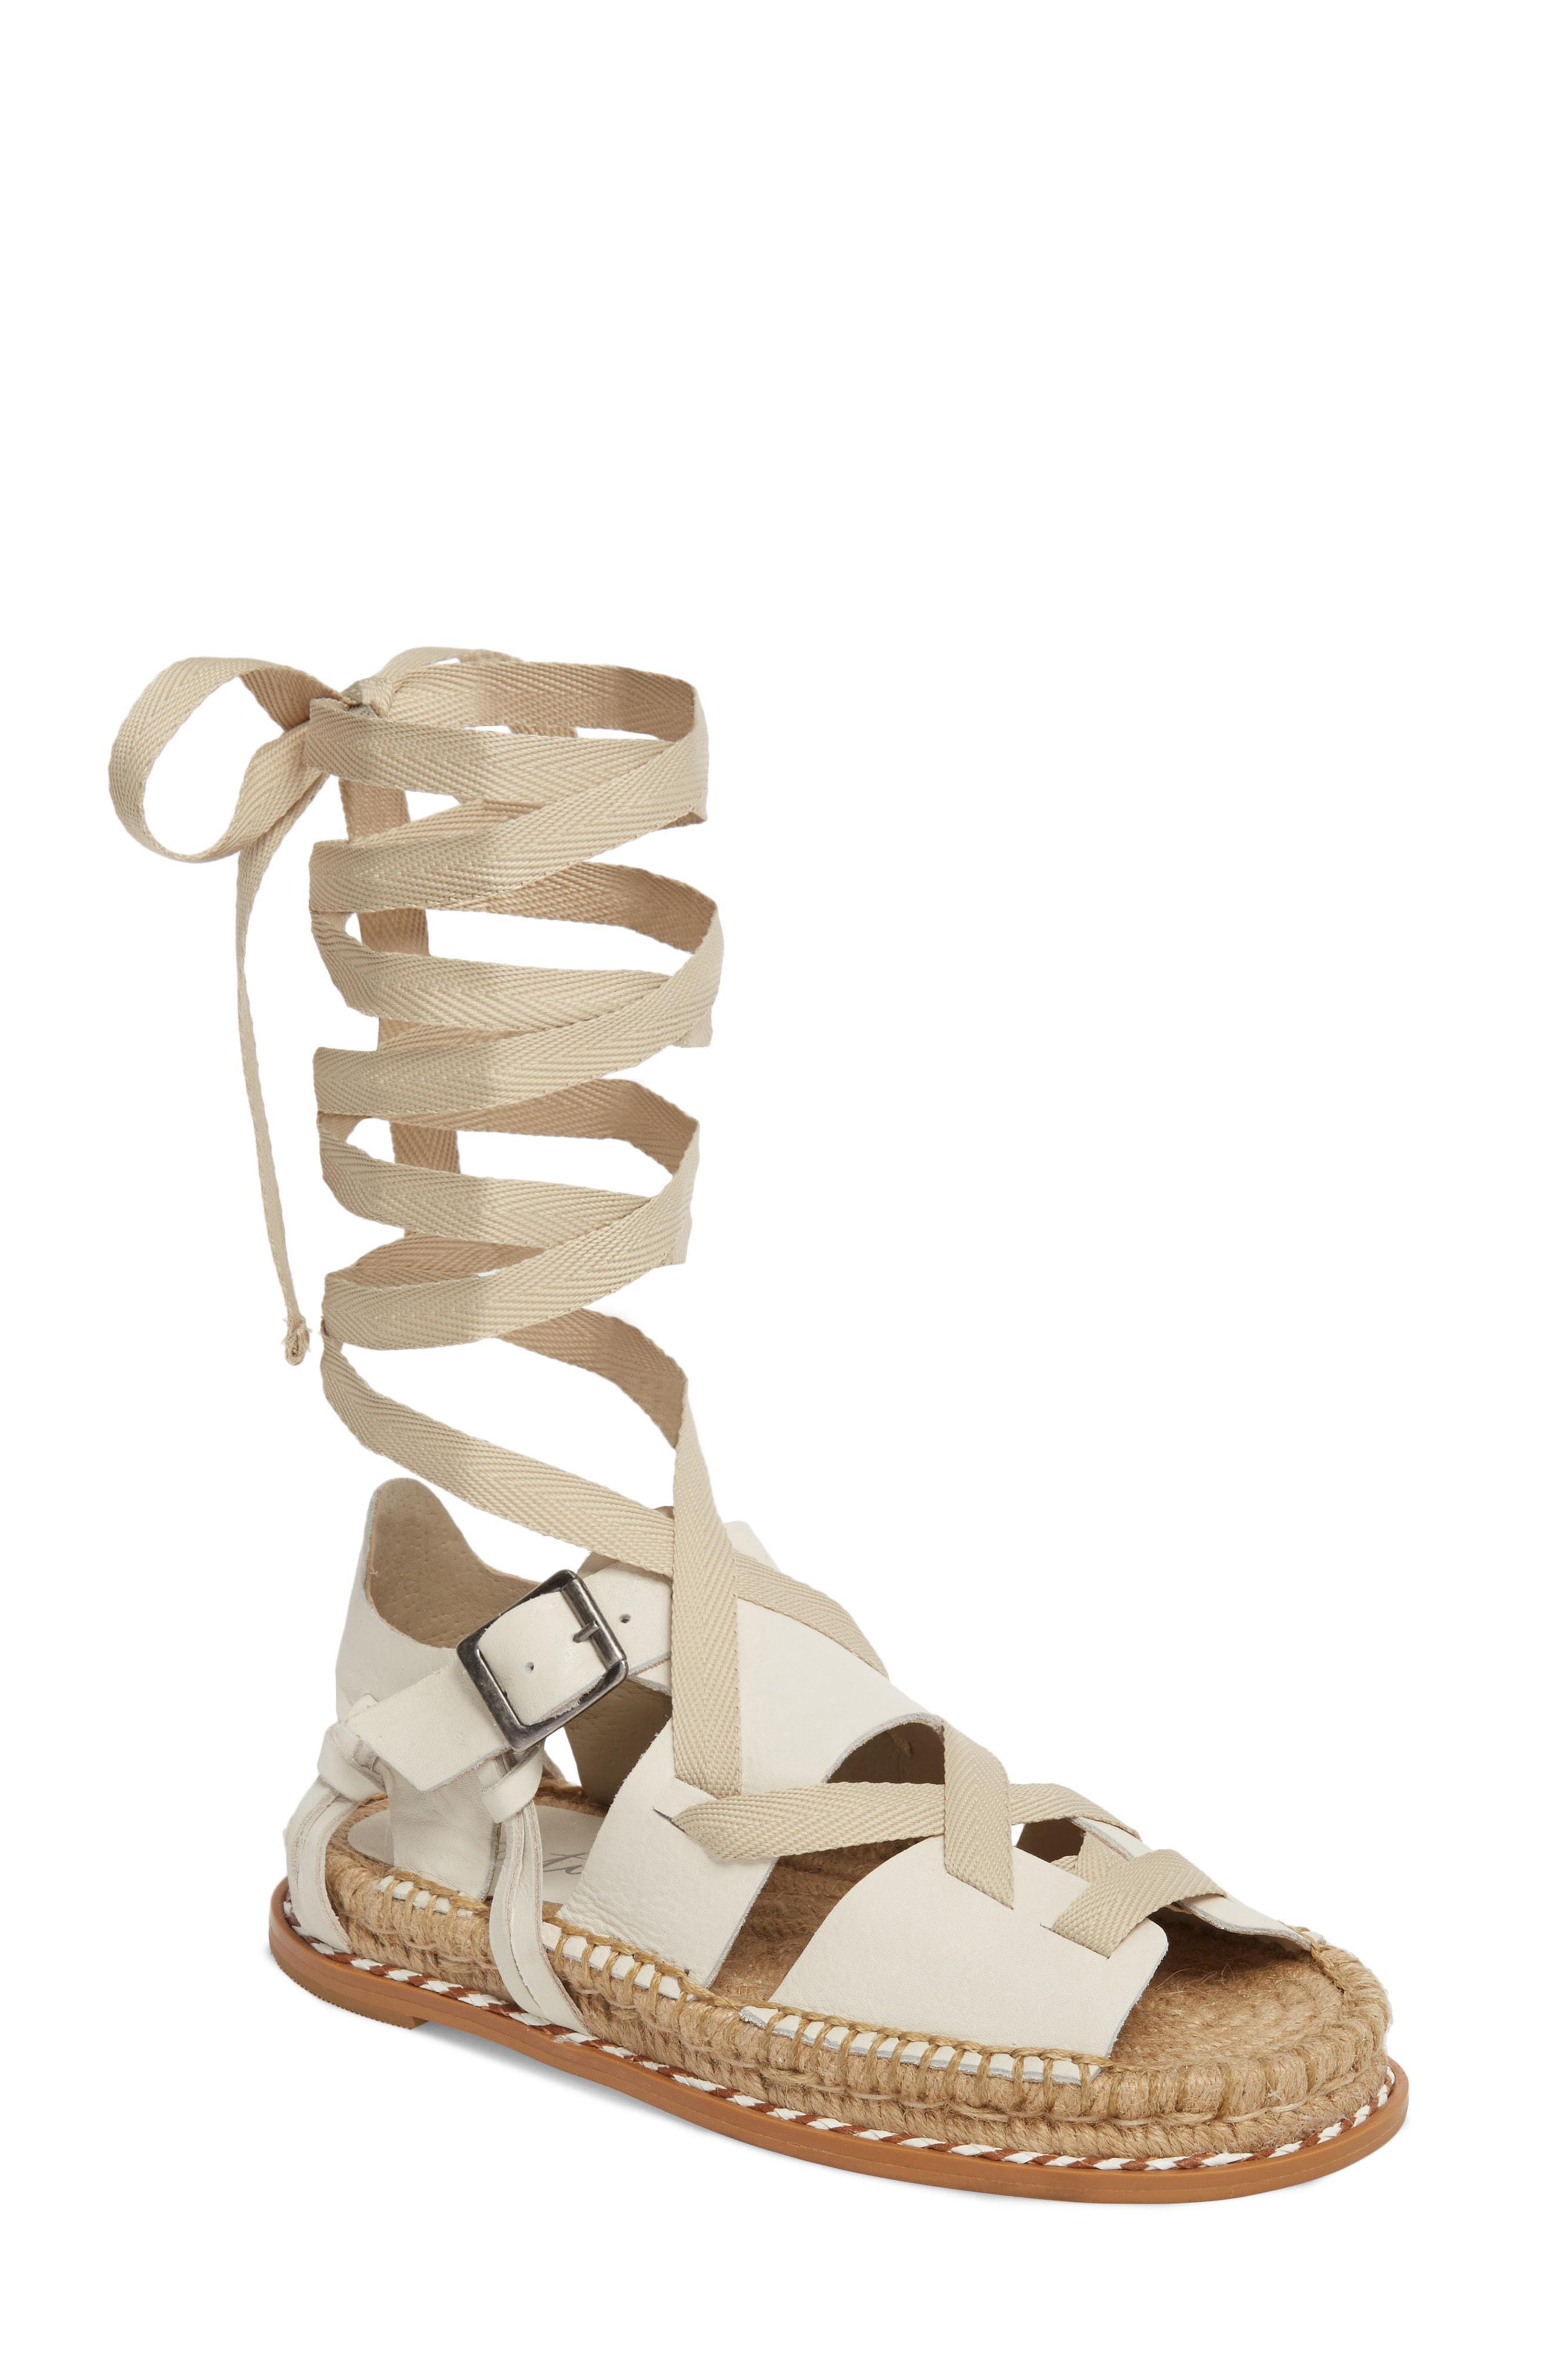 7fb1537a5802 Lyst matisse tabby gladiator sandal in white jpg 2640x4048 Matisse  gladiator sandals